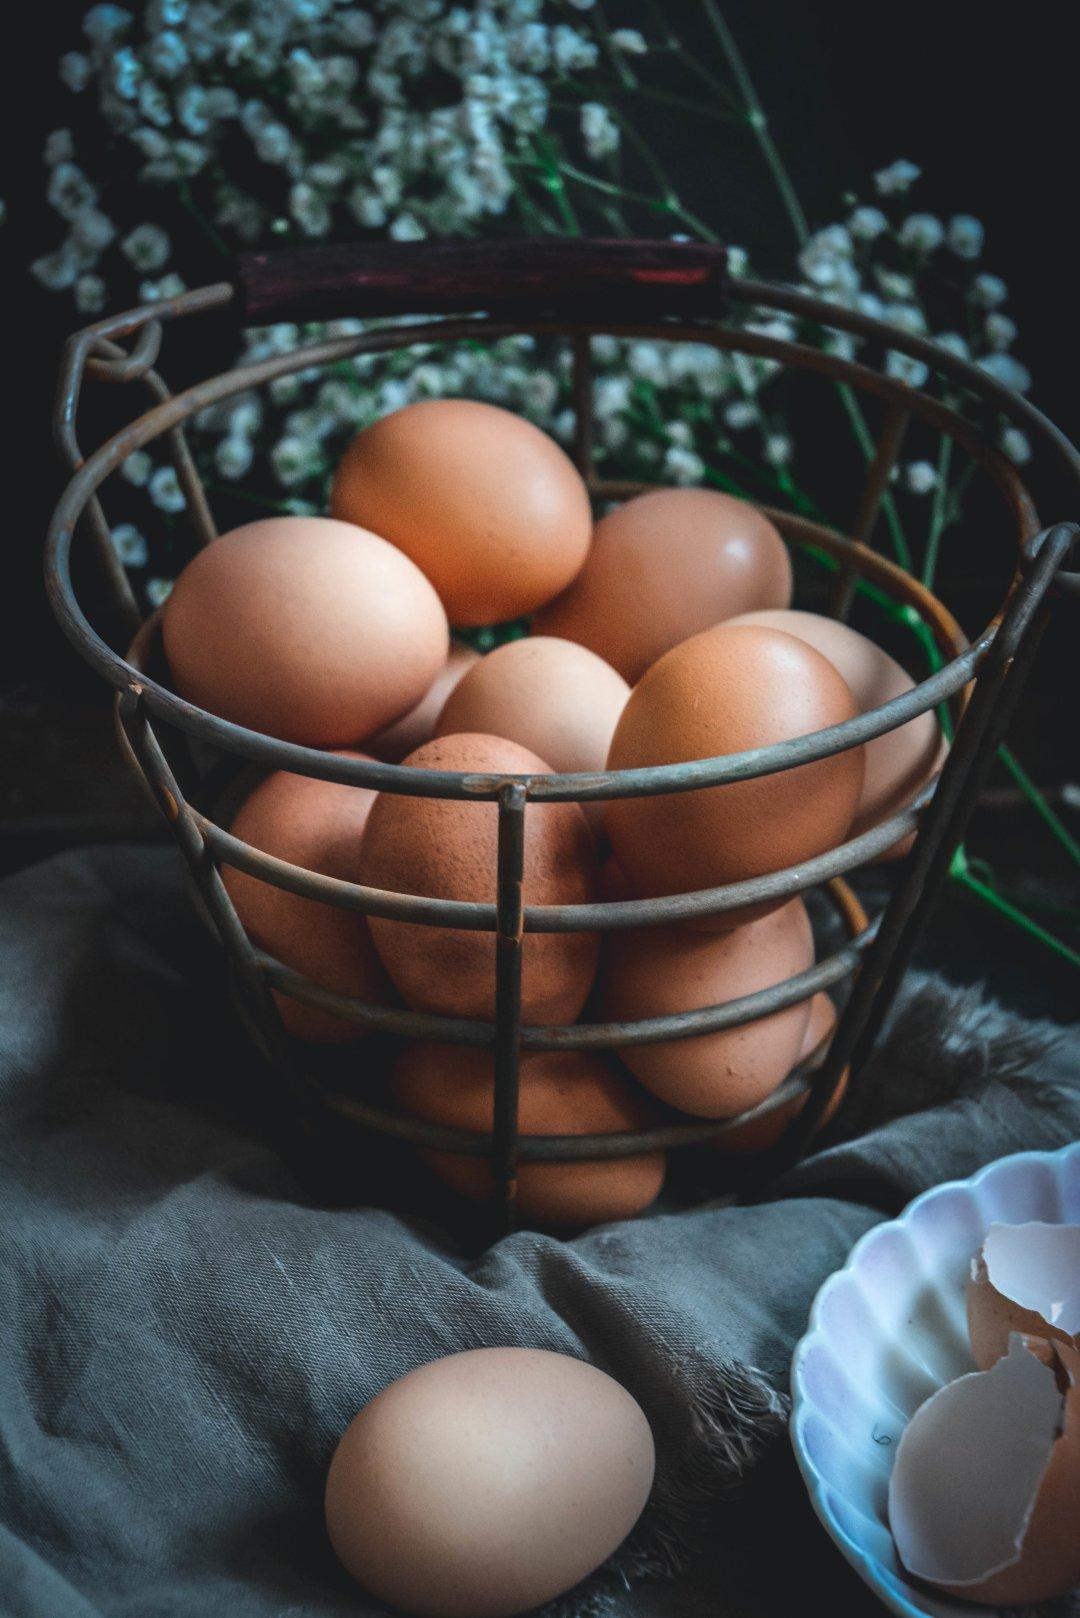 Eggs in basket on napkin